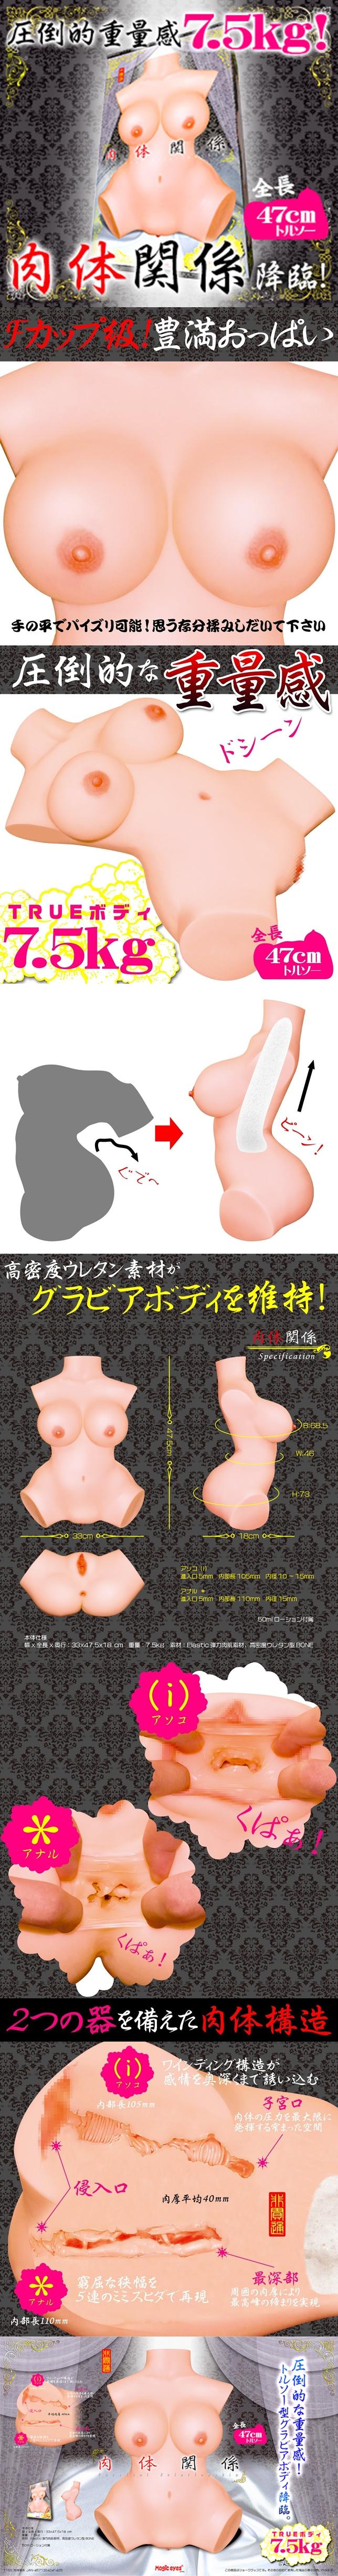 巨乳 乳交